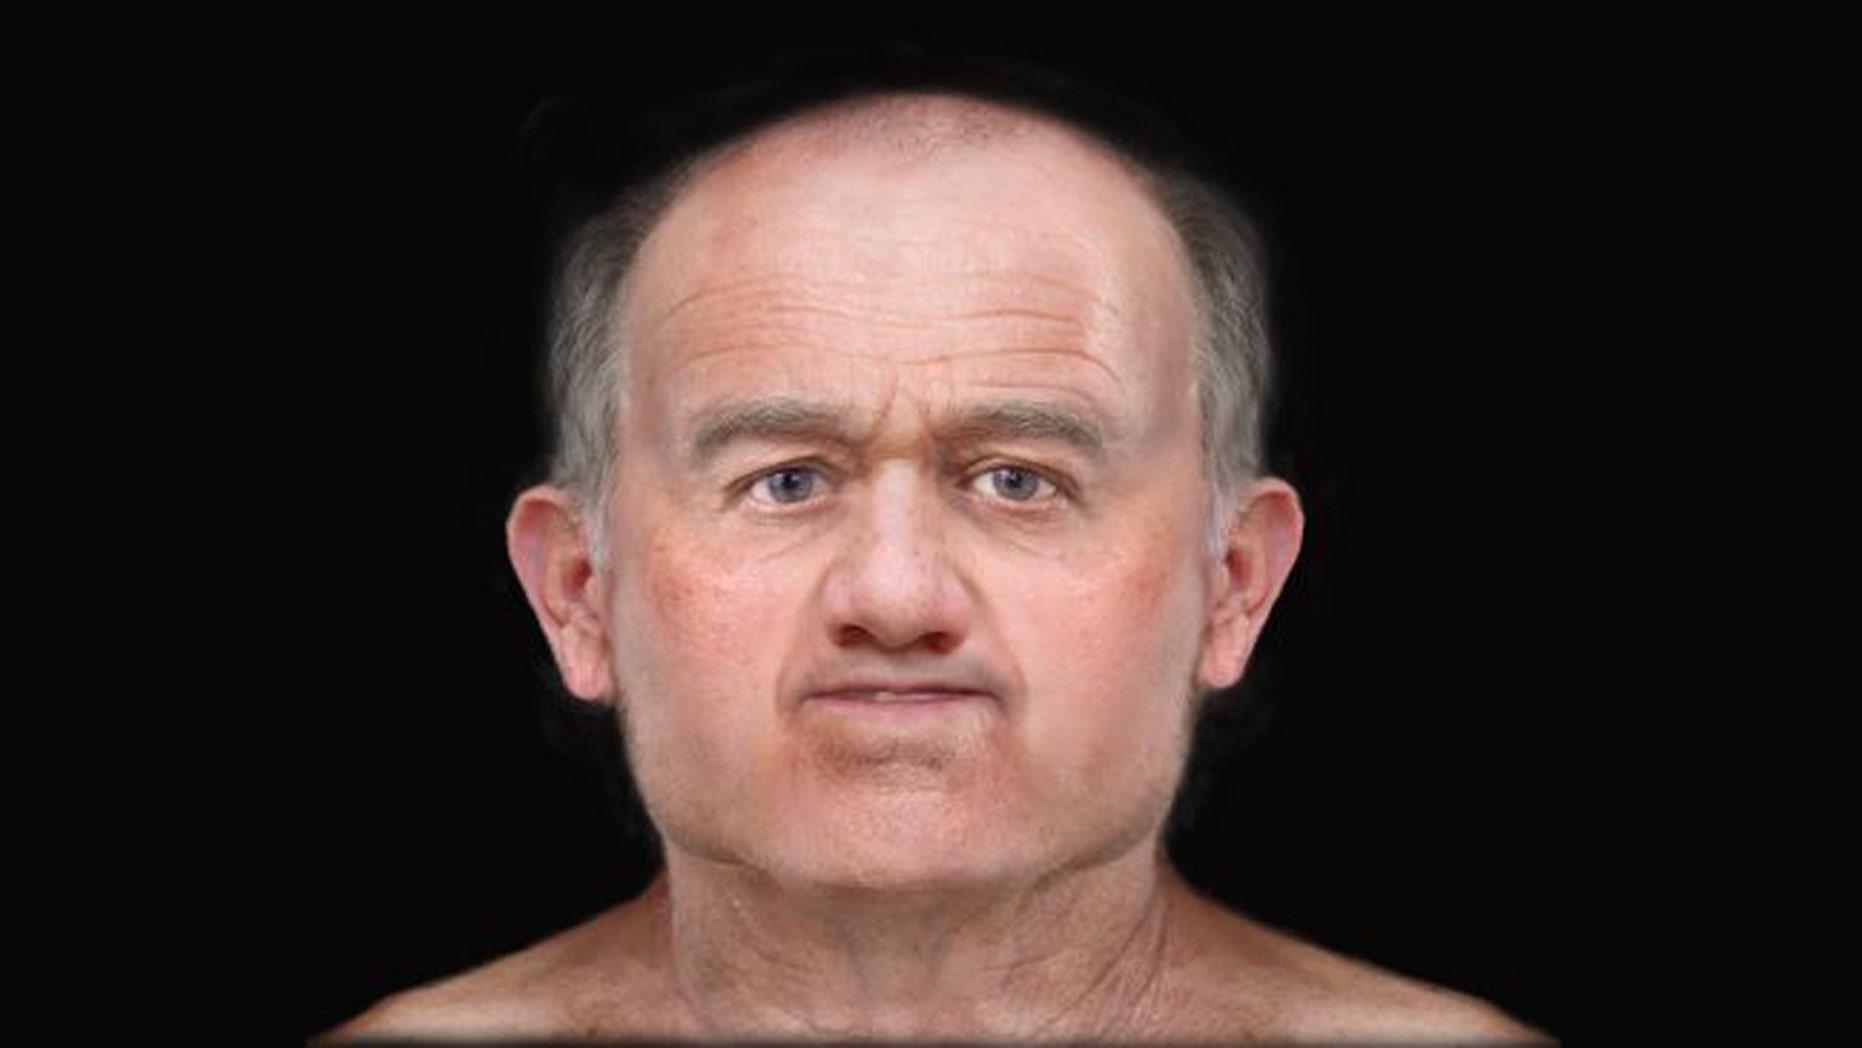 A digital facial reconstruction reveals the face of